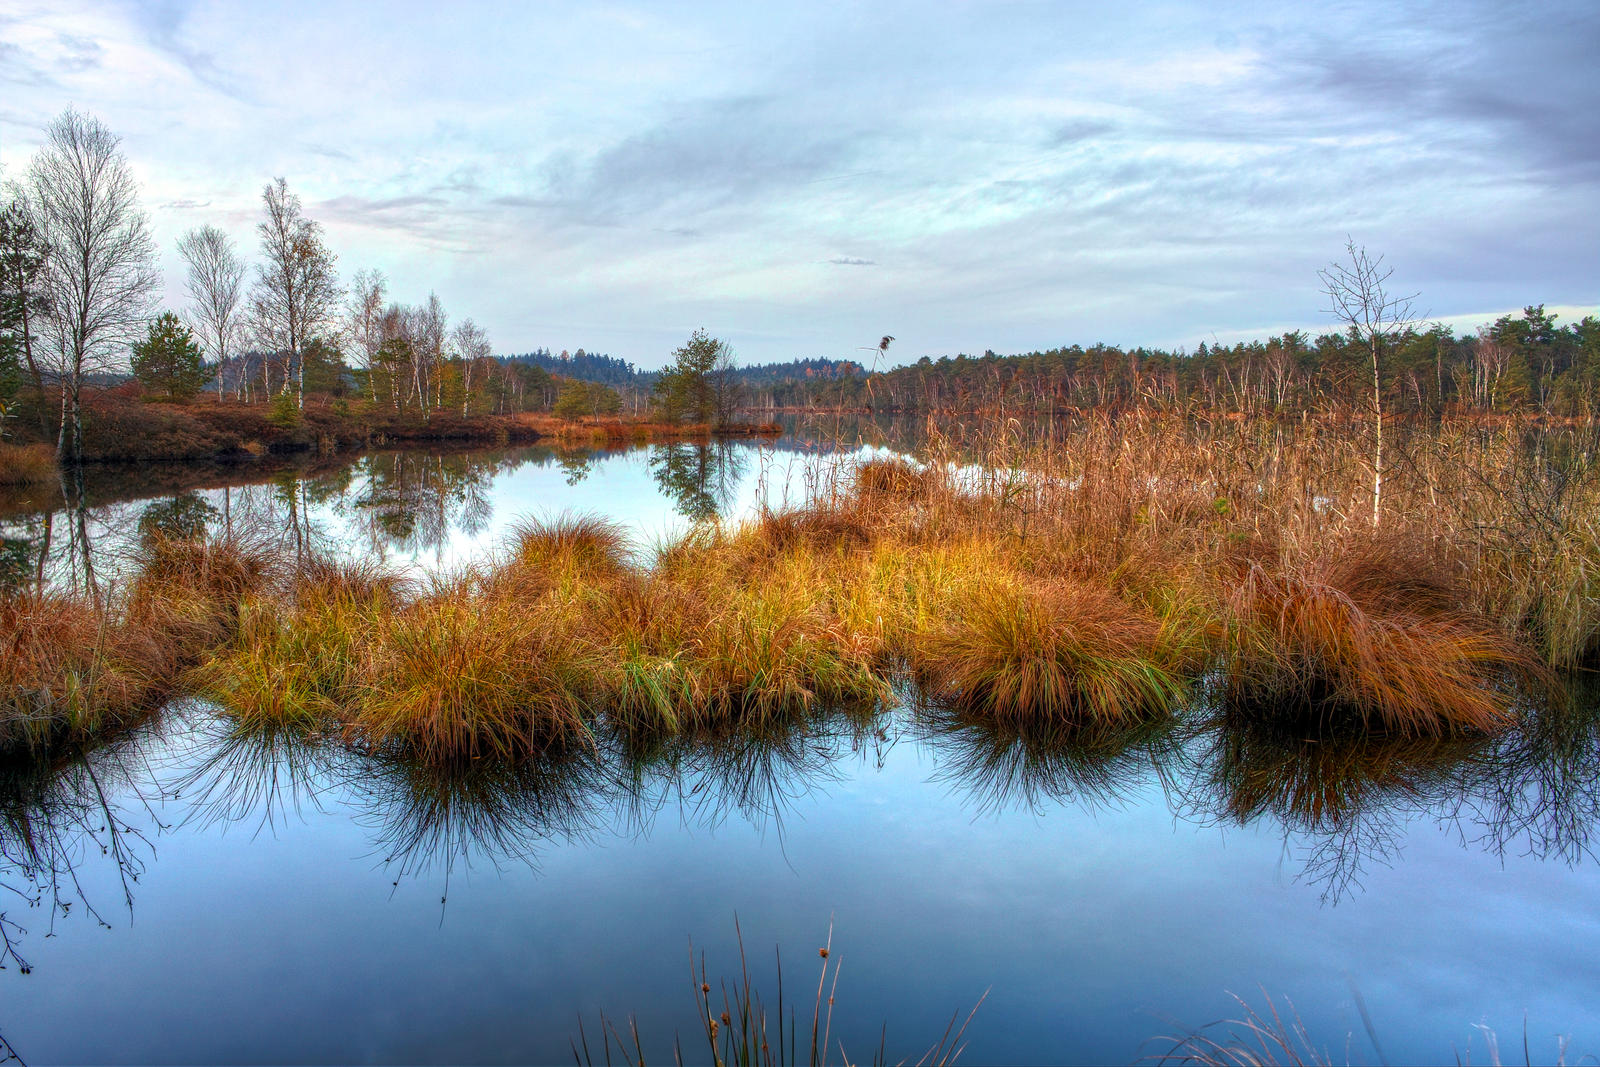 Calm Lake by Burtn